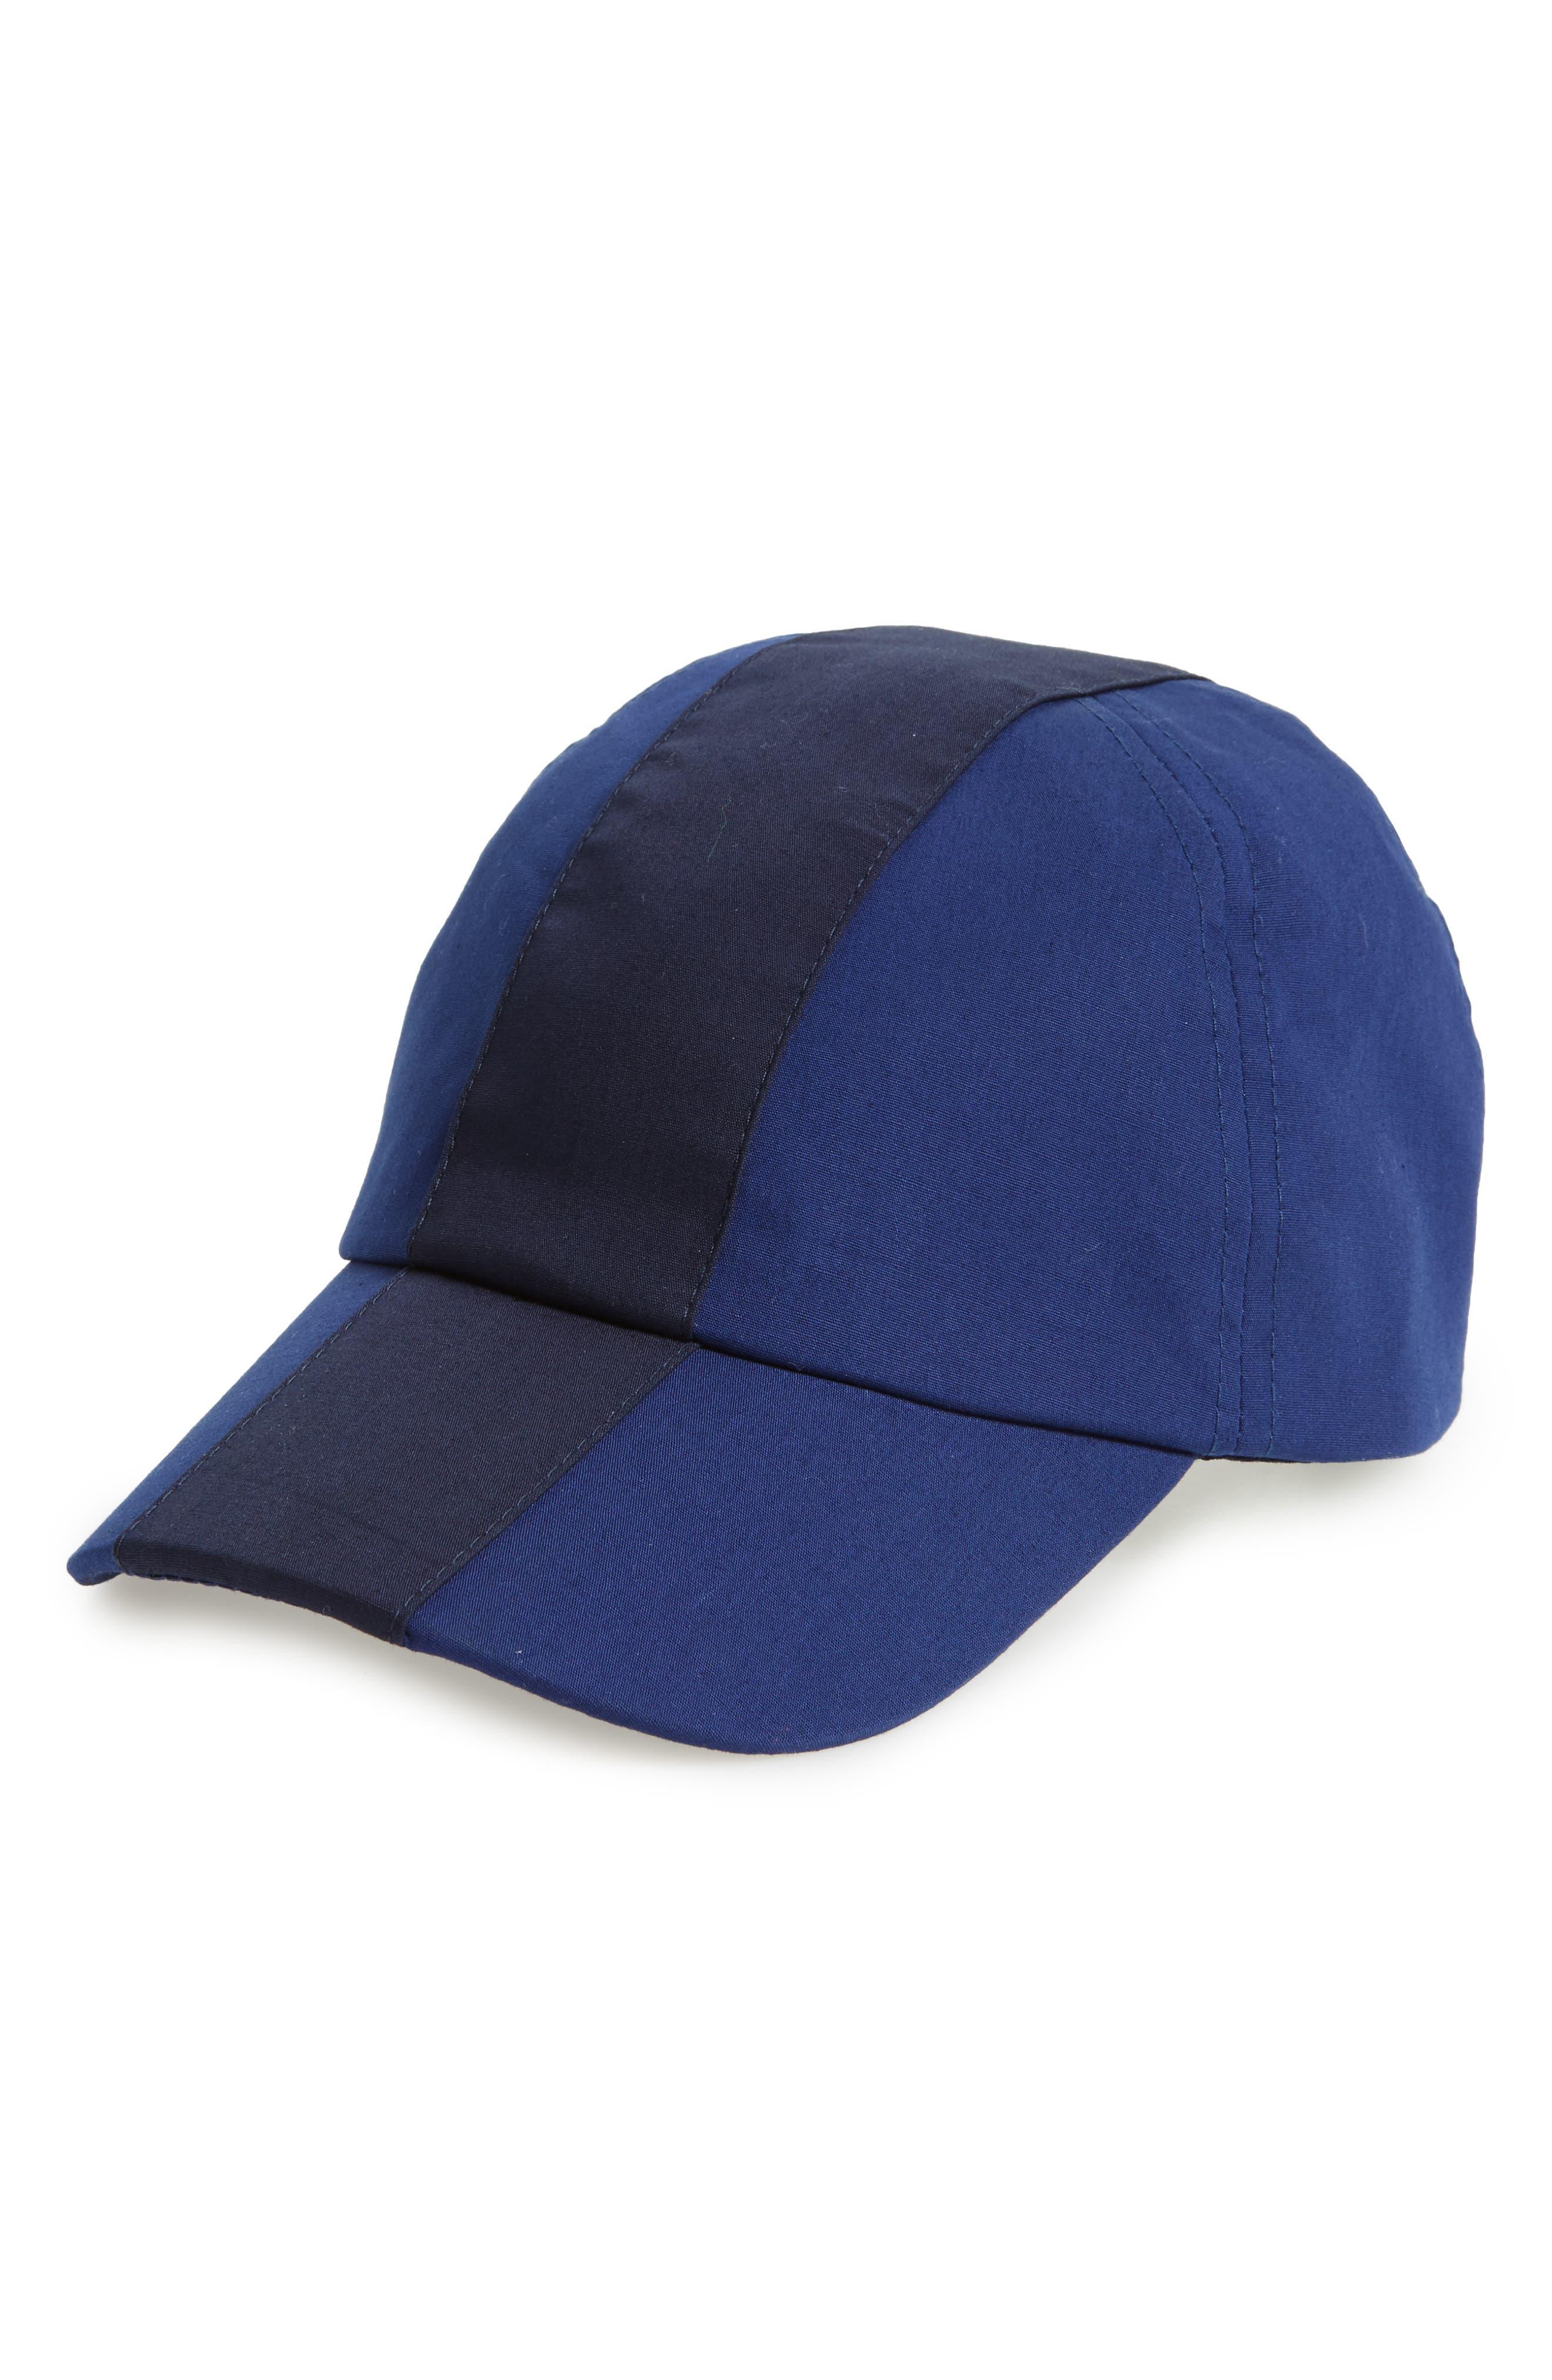 Lacoste Colorblock Baseball Cap